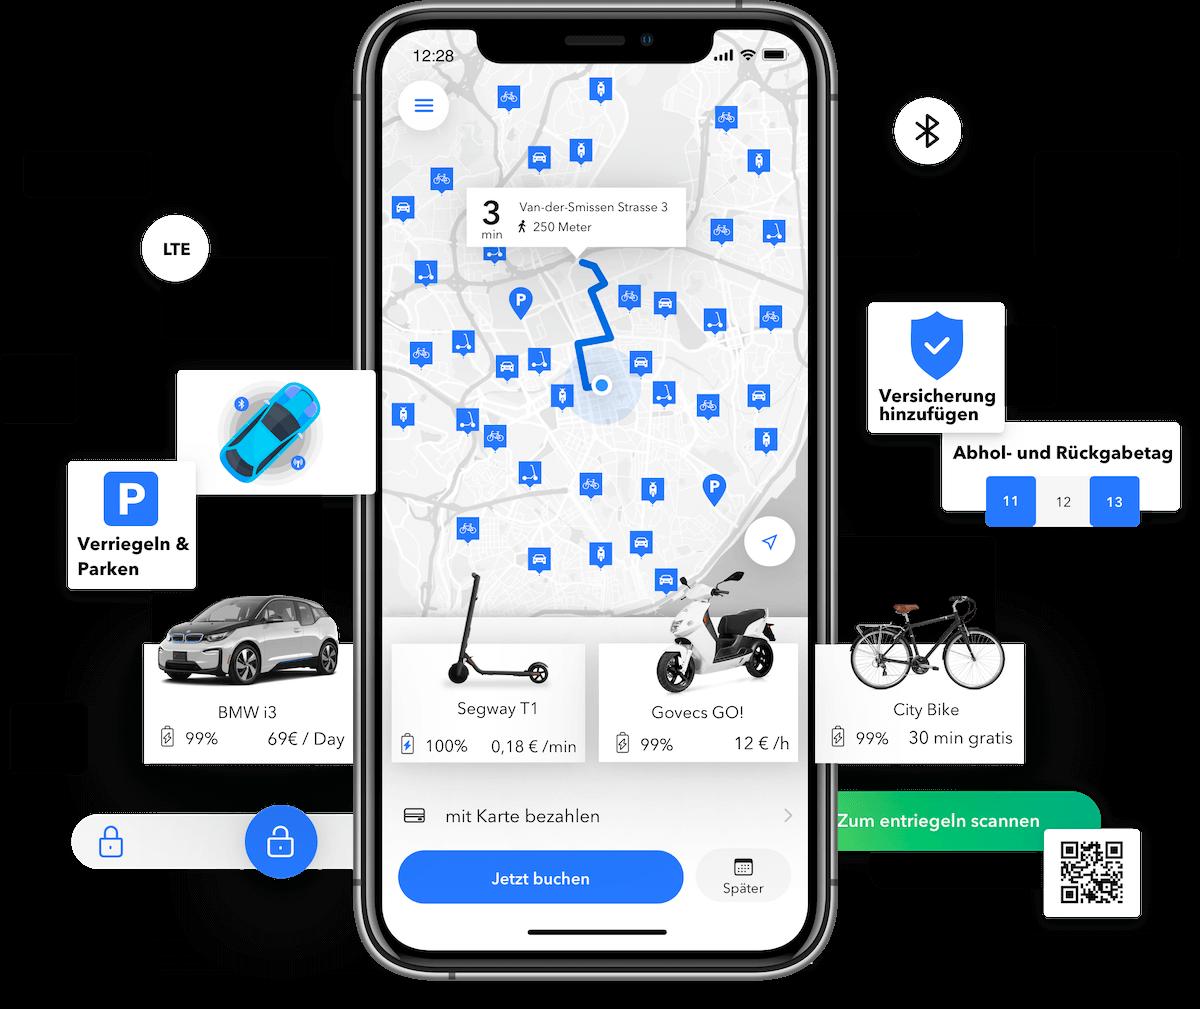 Carsharing, Scooter-Sharing, E-Bike Sharing Software